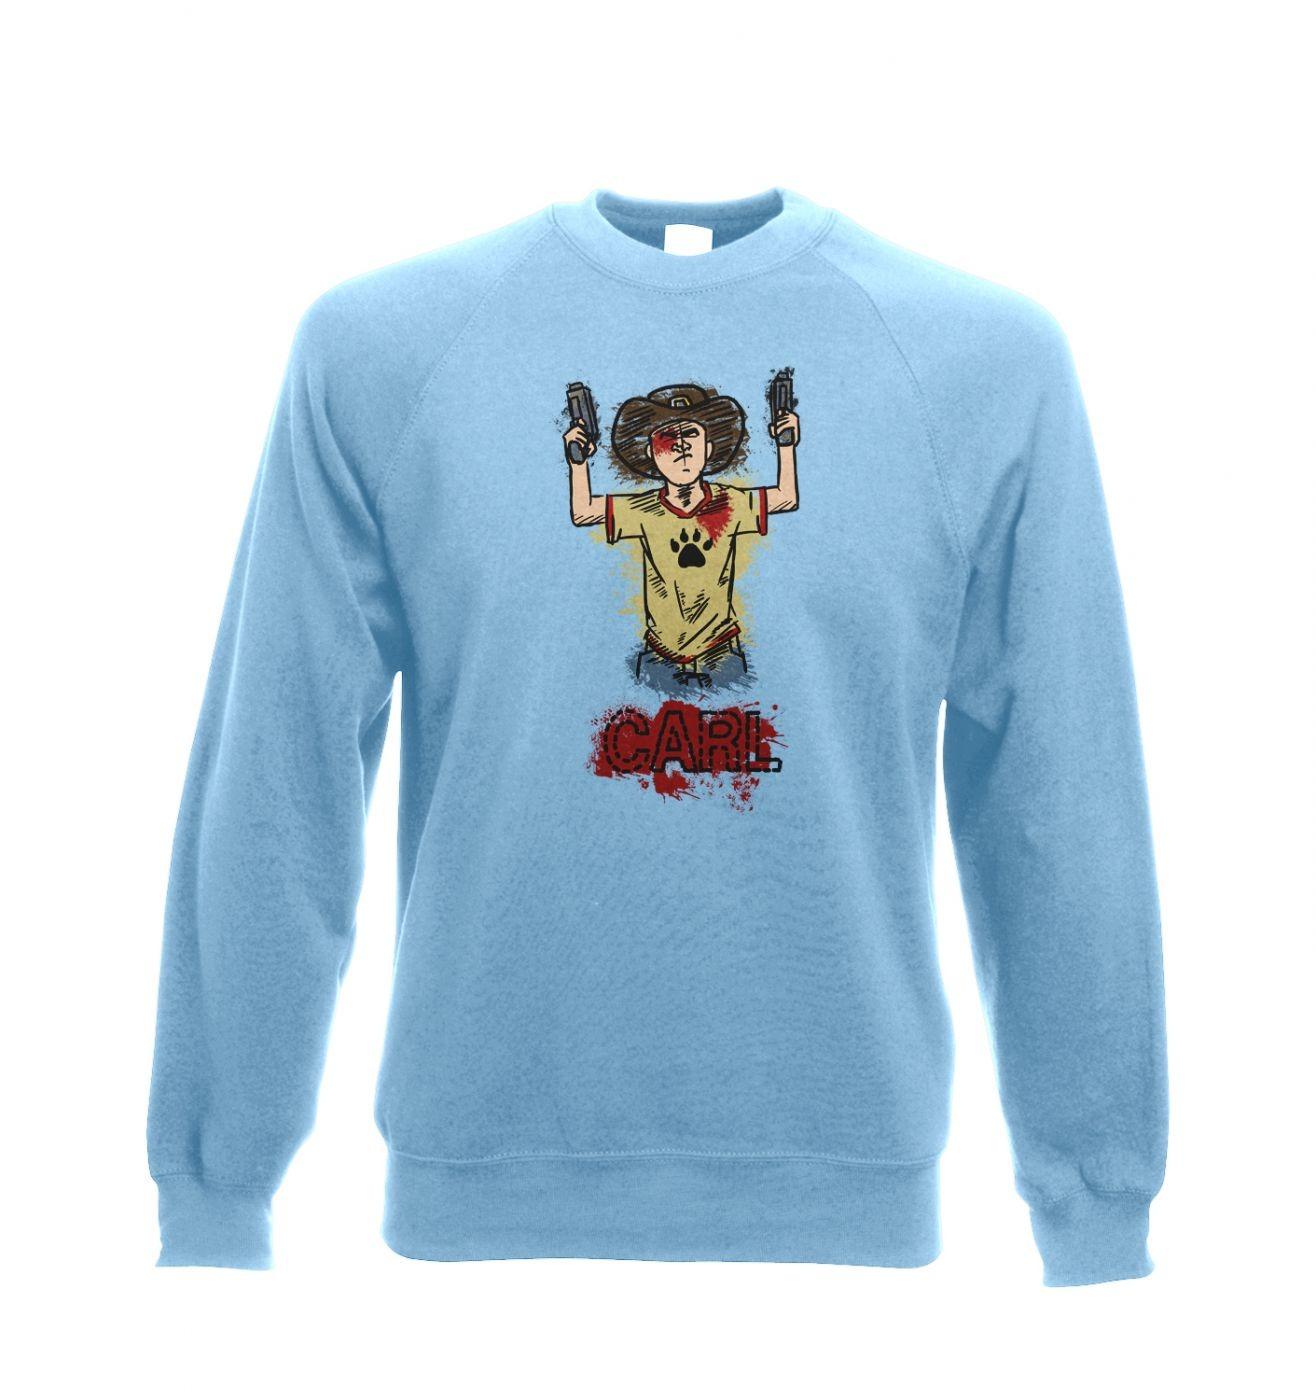 Kid with guns crewneck sweatshirt